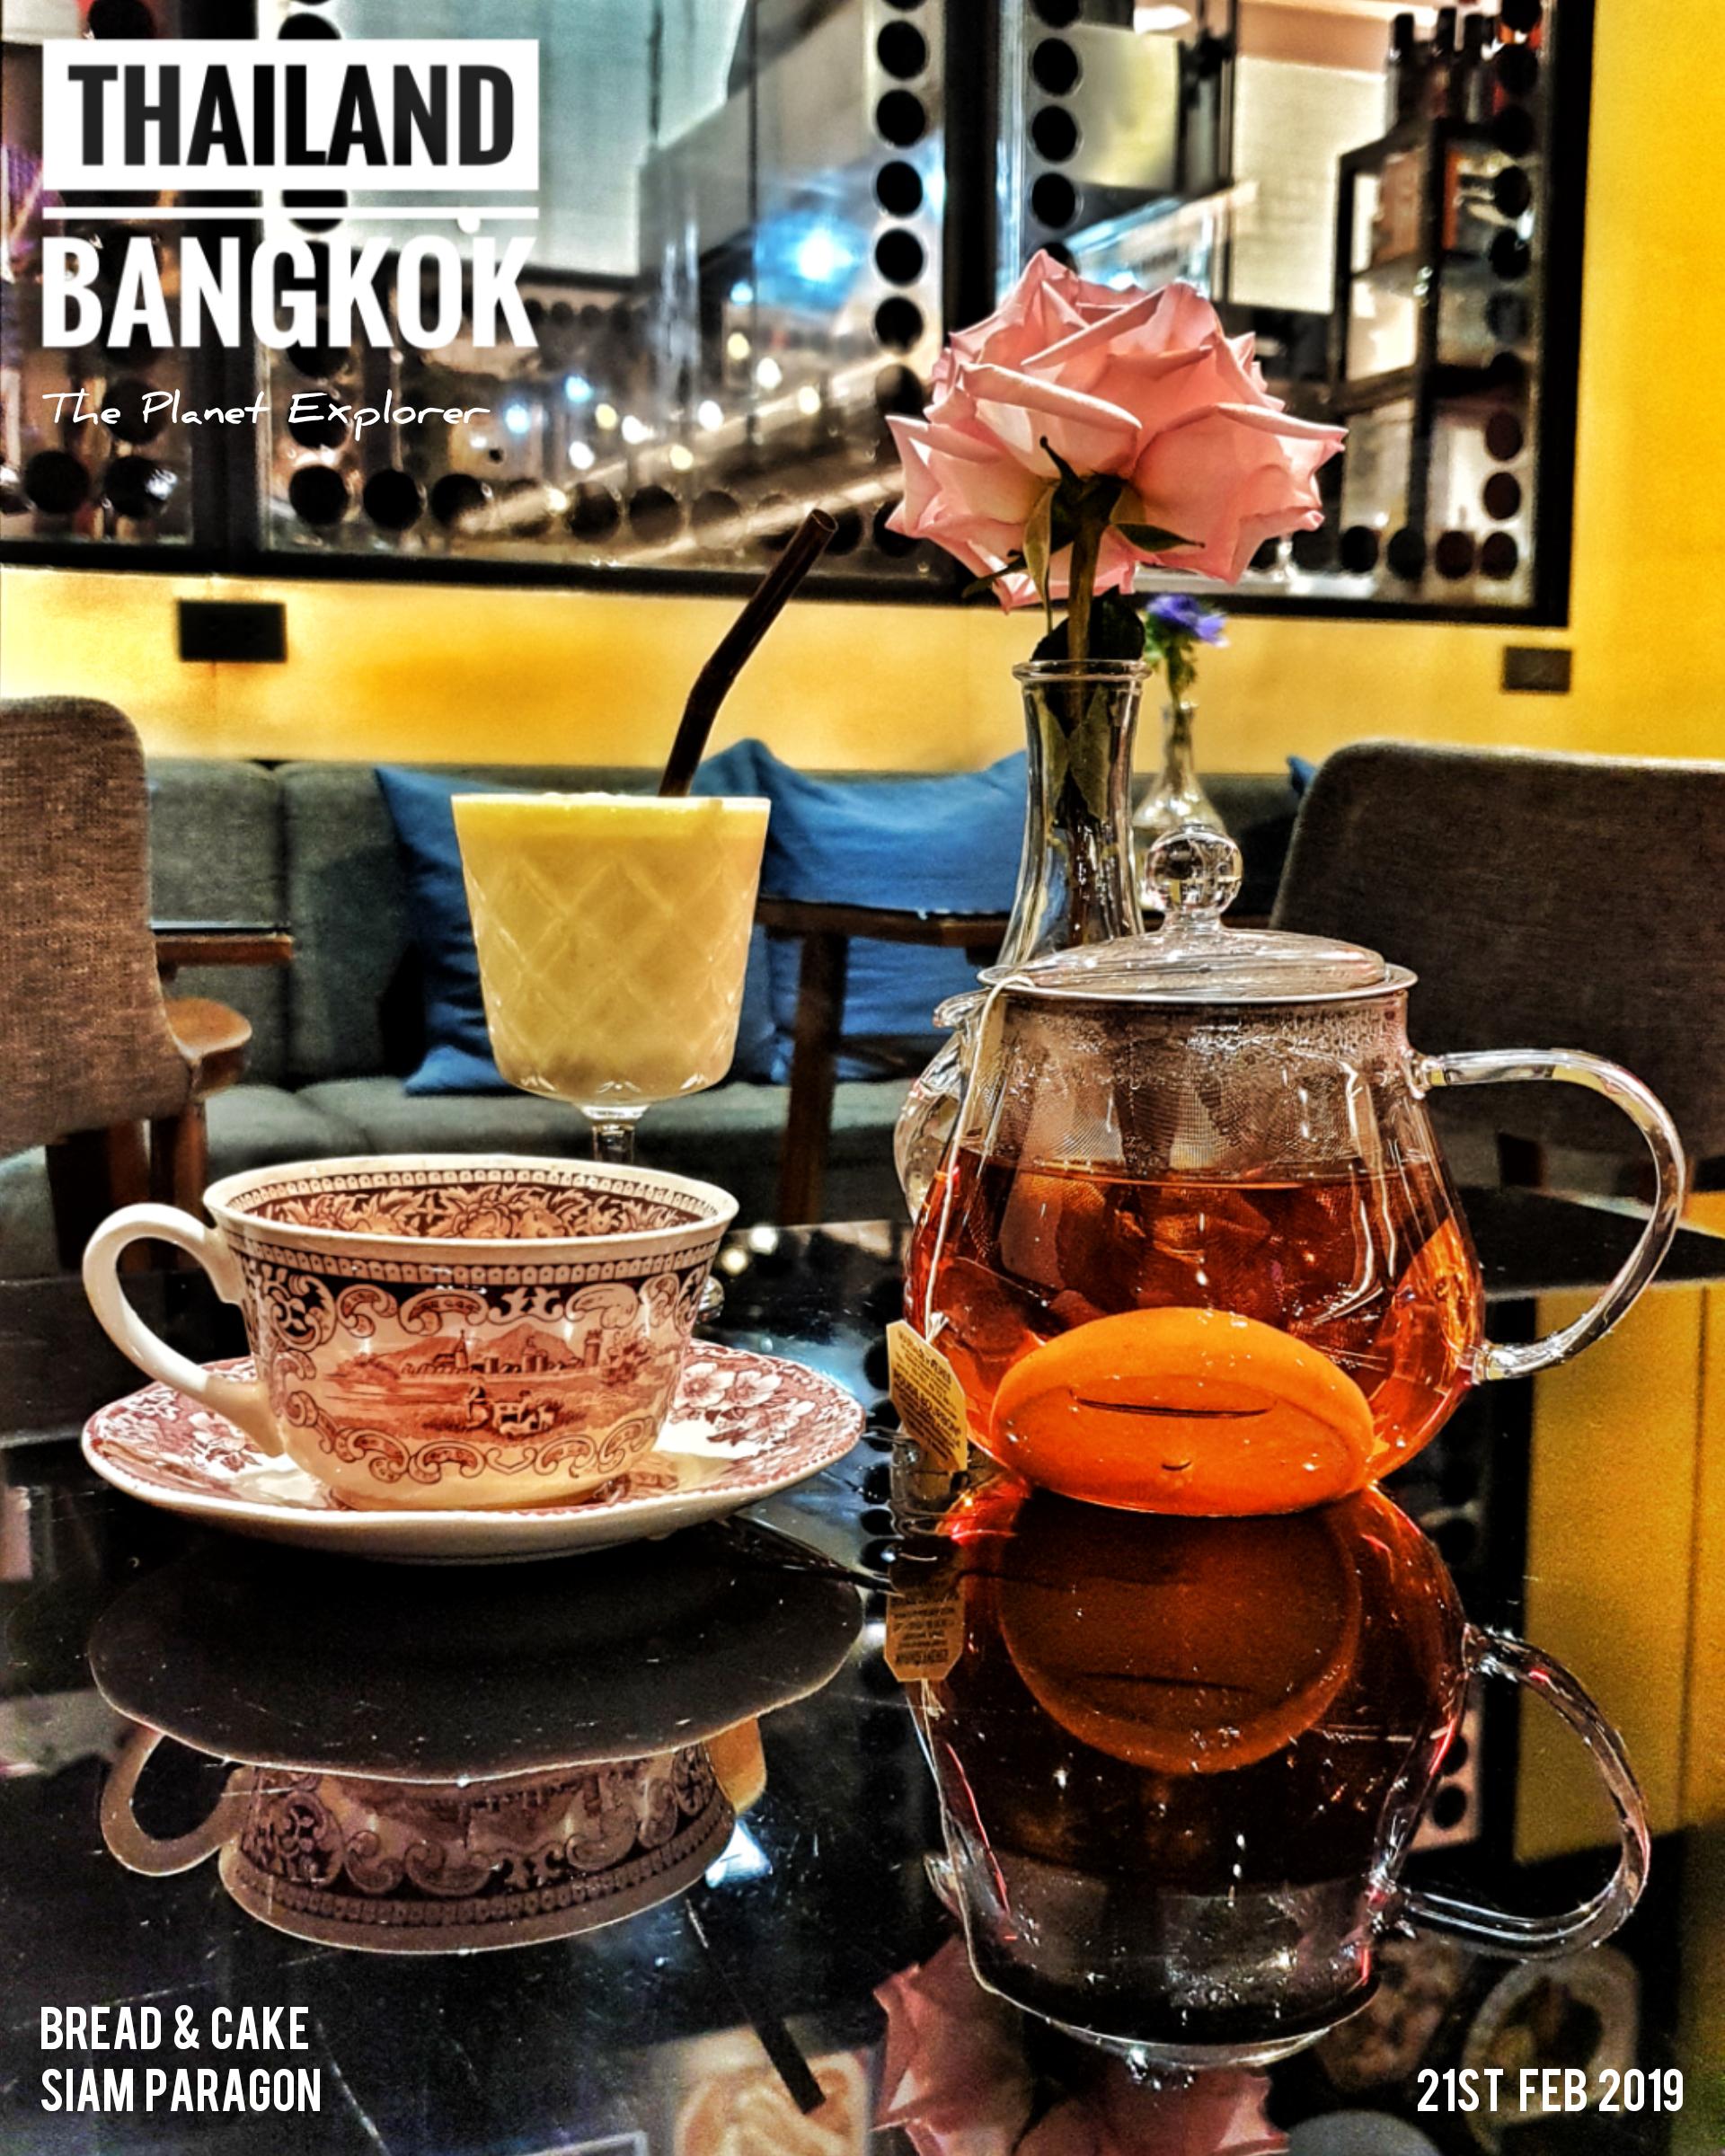 20190221_1741_Thailand_Bangkok_Siam Paragon_Samsung N9_5x4_4.05mb_@_w (1)